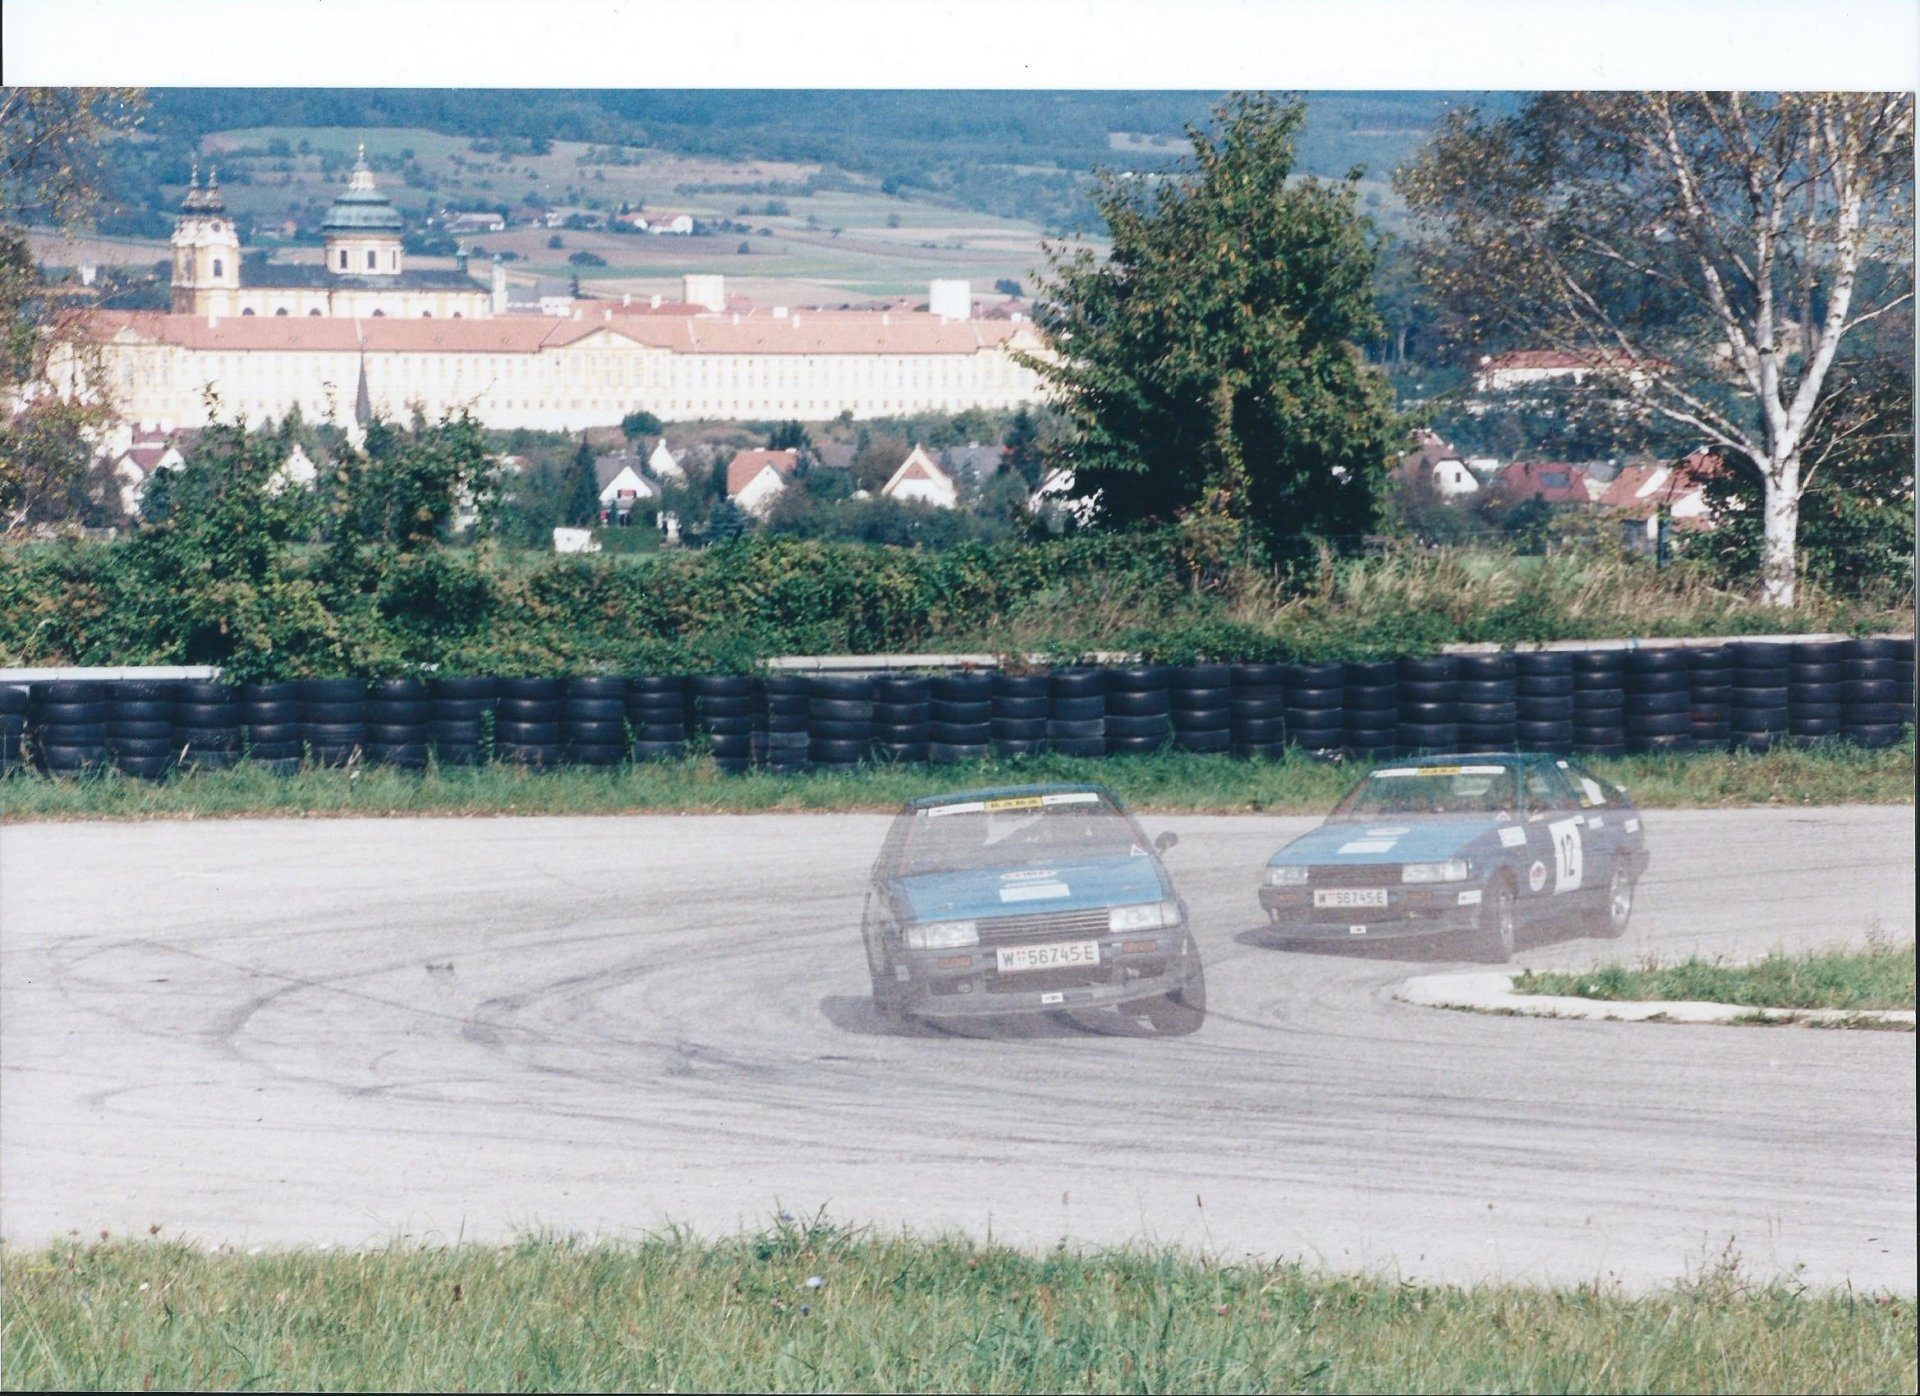 Doppel AE86 Melk.jpg